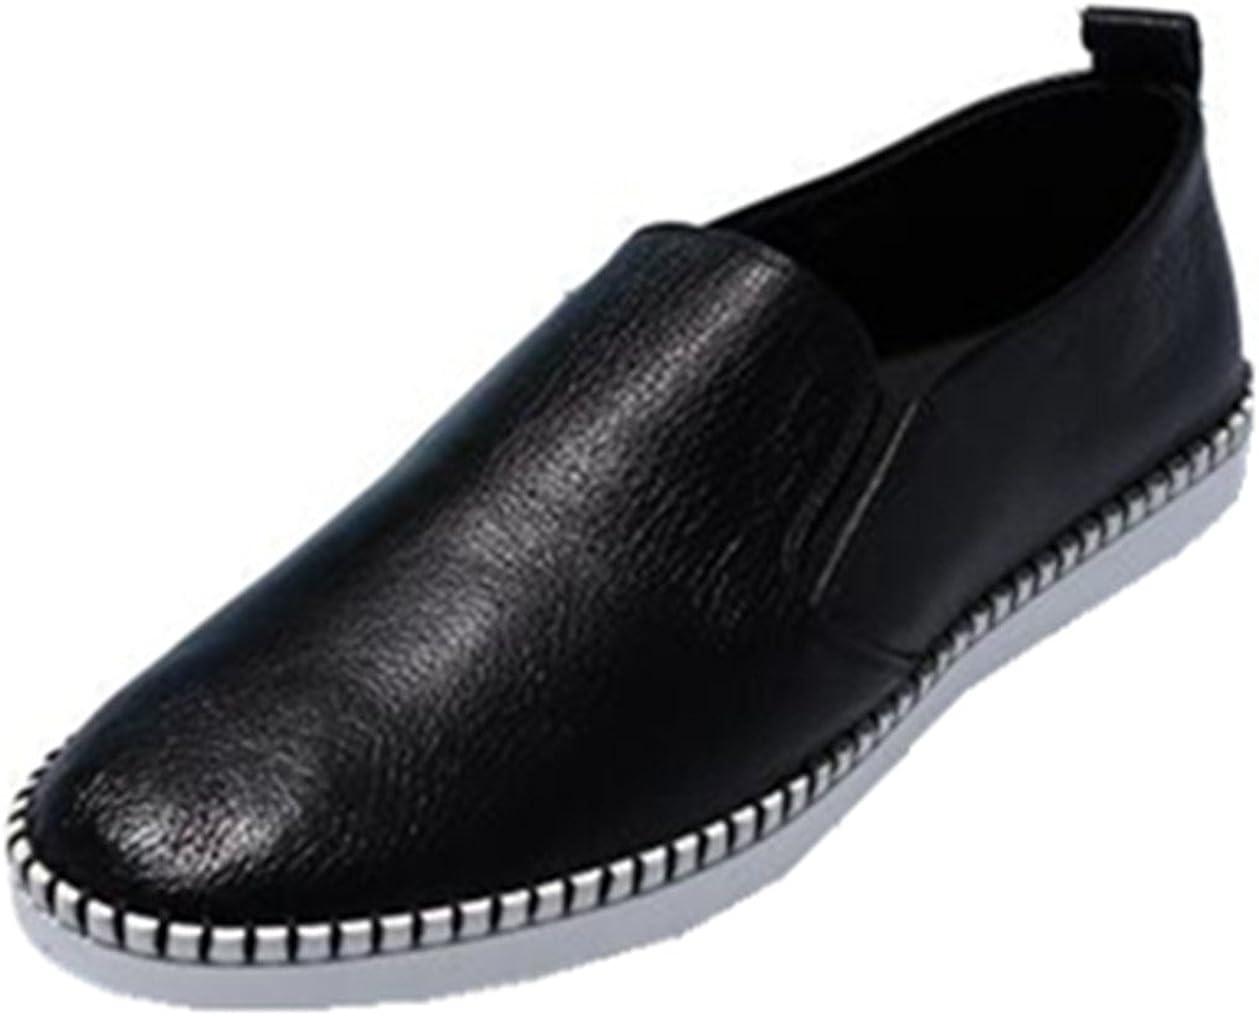 HAPPYSHOP TM Men's Very popular Casual Leather Ventilated Moccasin Light Bargain Slip